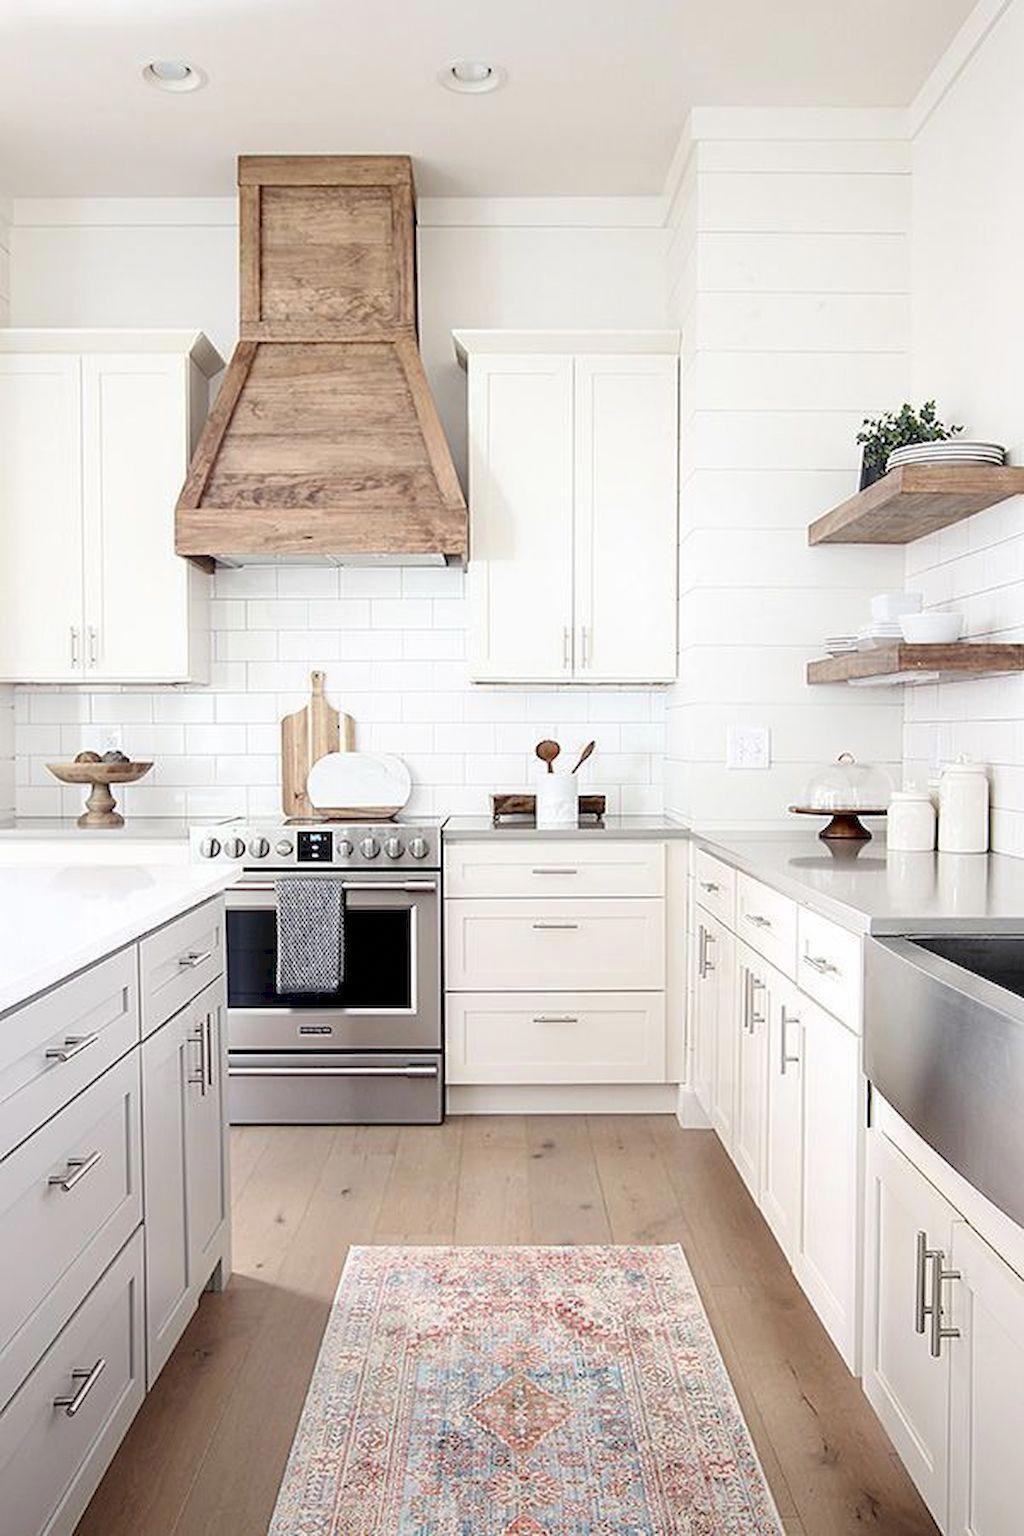 facts on unique kitchen cabinets diy kitchenideas2018 kitchenremodelatl kitche shaker on farmhouse kitchen hutch id=23808